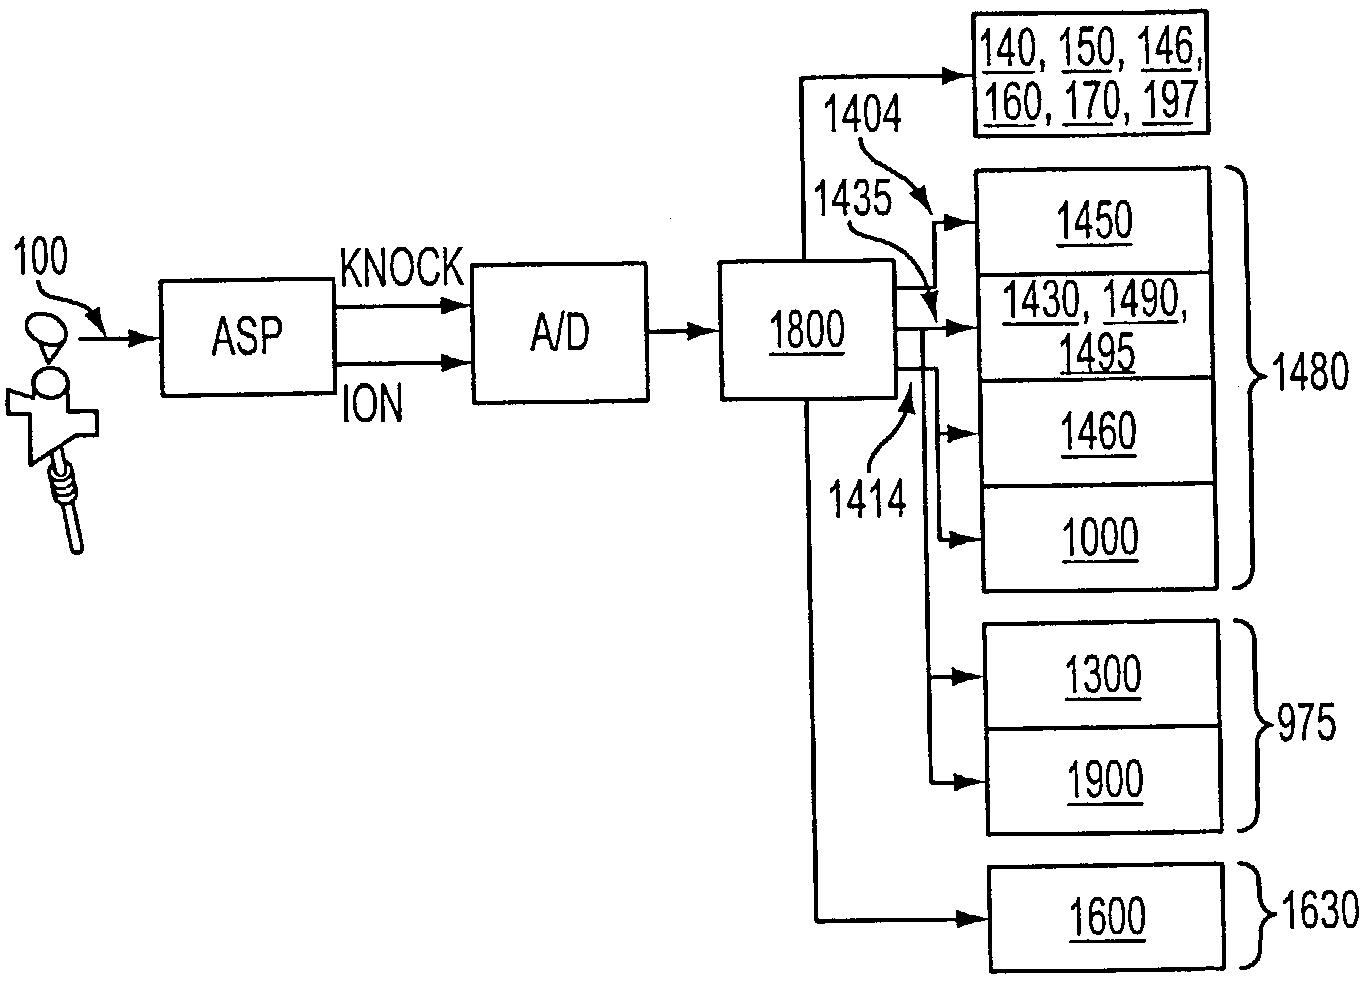 2005 Hyundai Santa Fe Fuse Box | Wiring Diagram Database